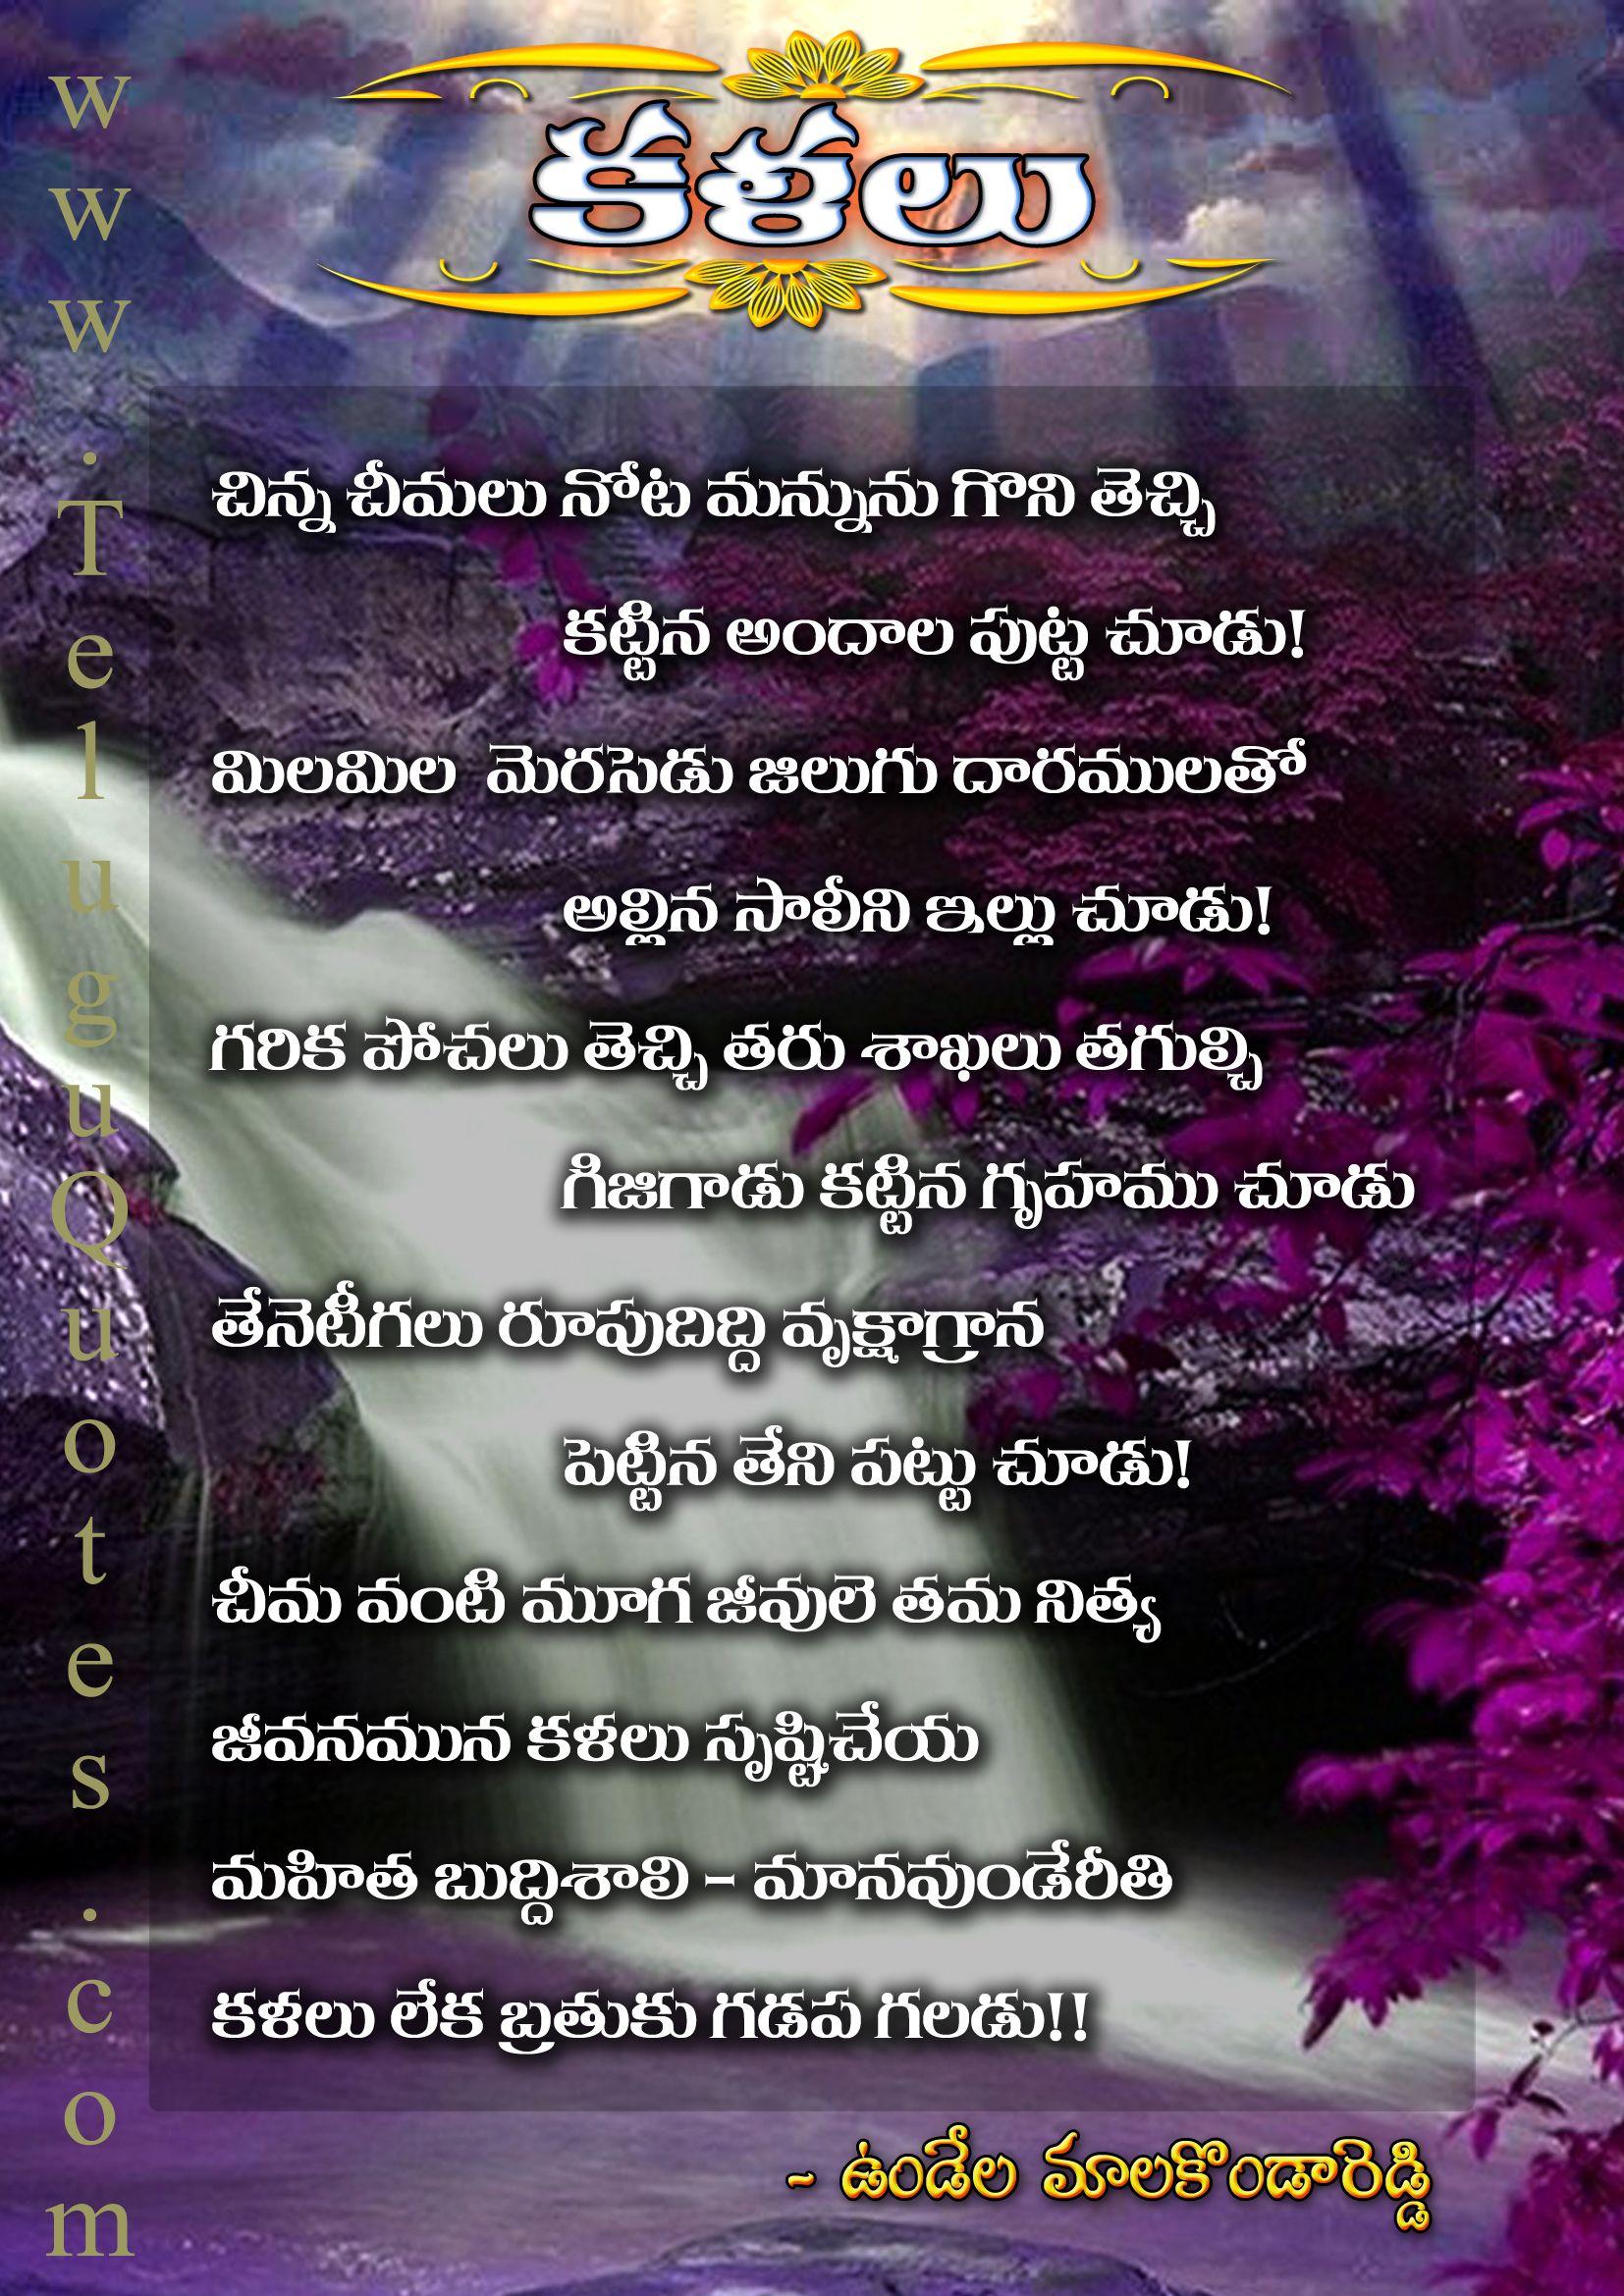 Pin by TeluguQuotes on Telugu Poems | Telugu, Poems, Social